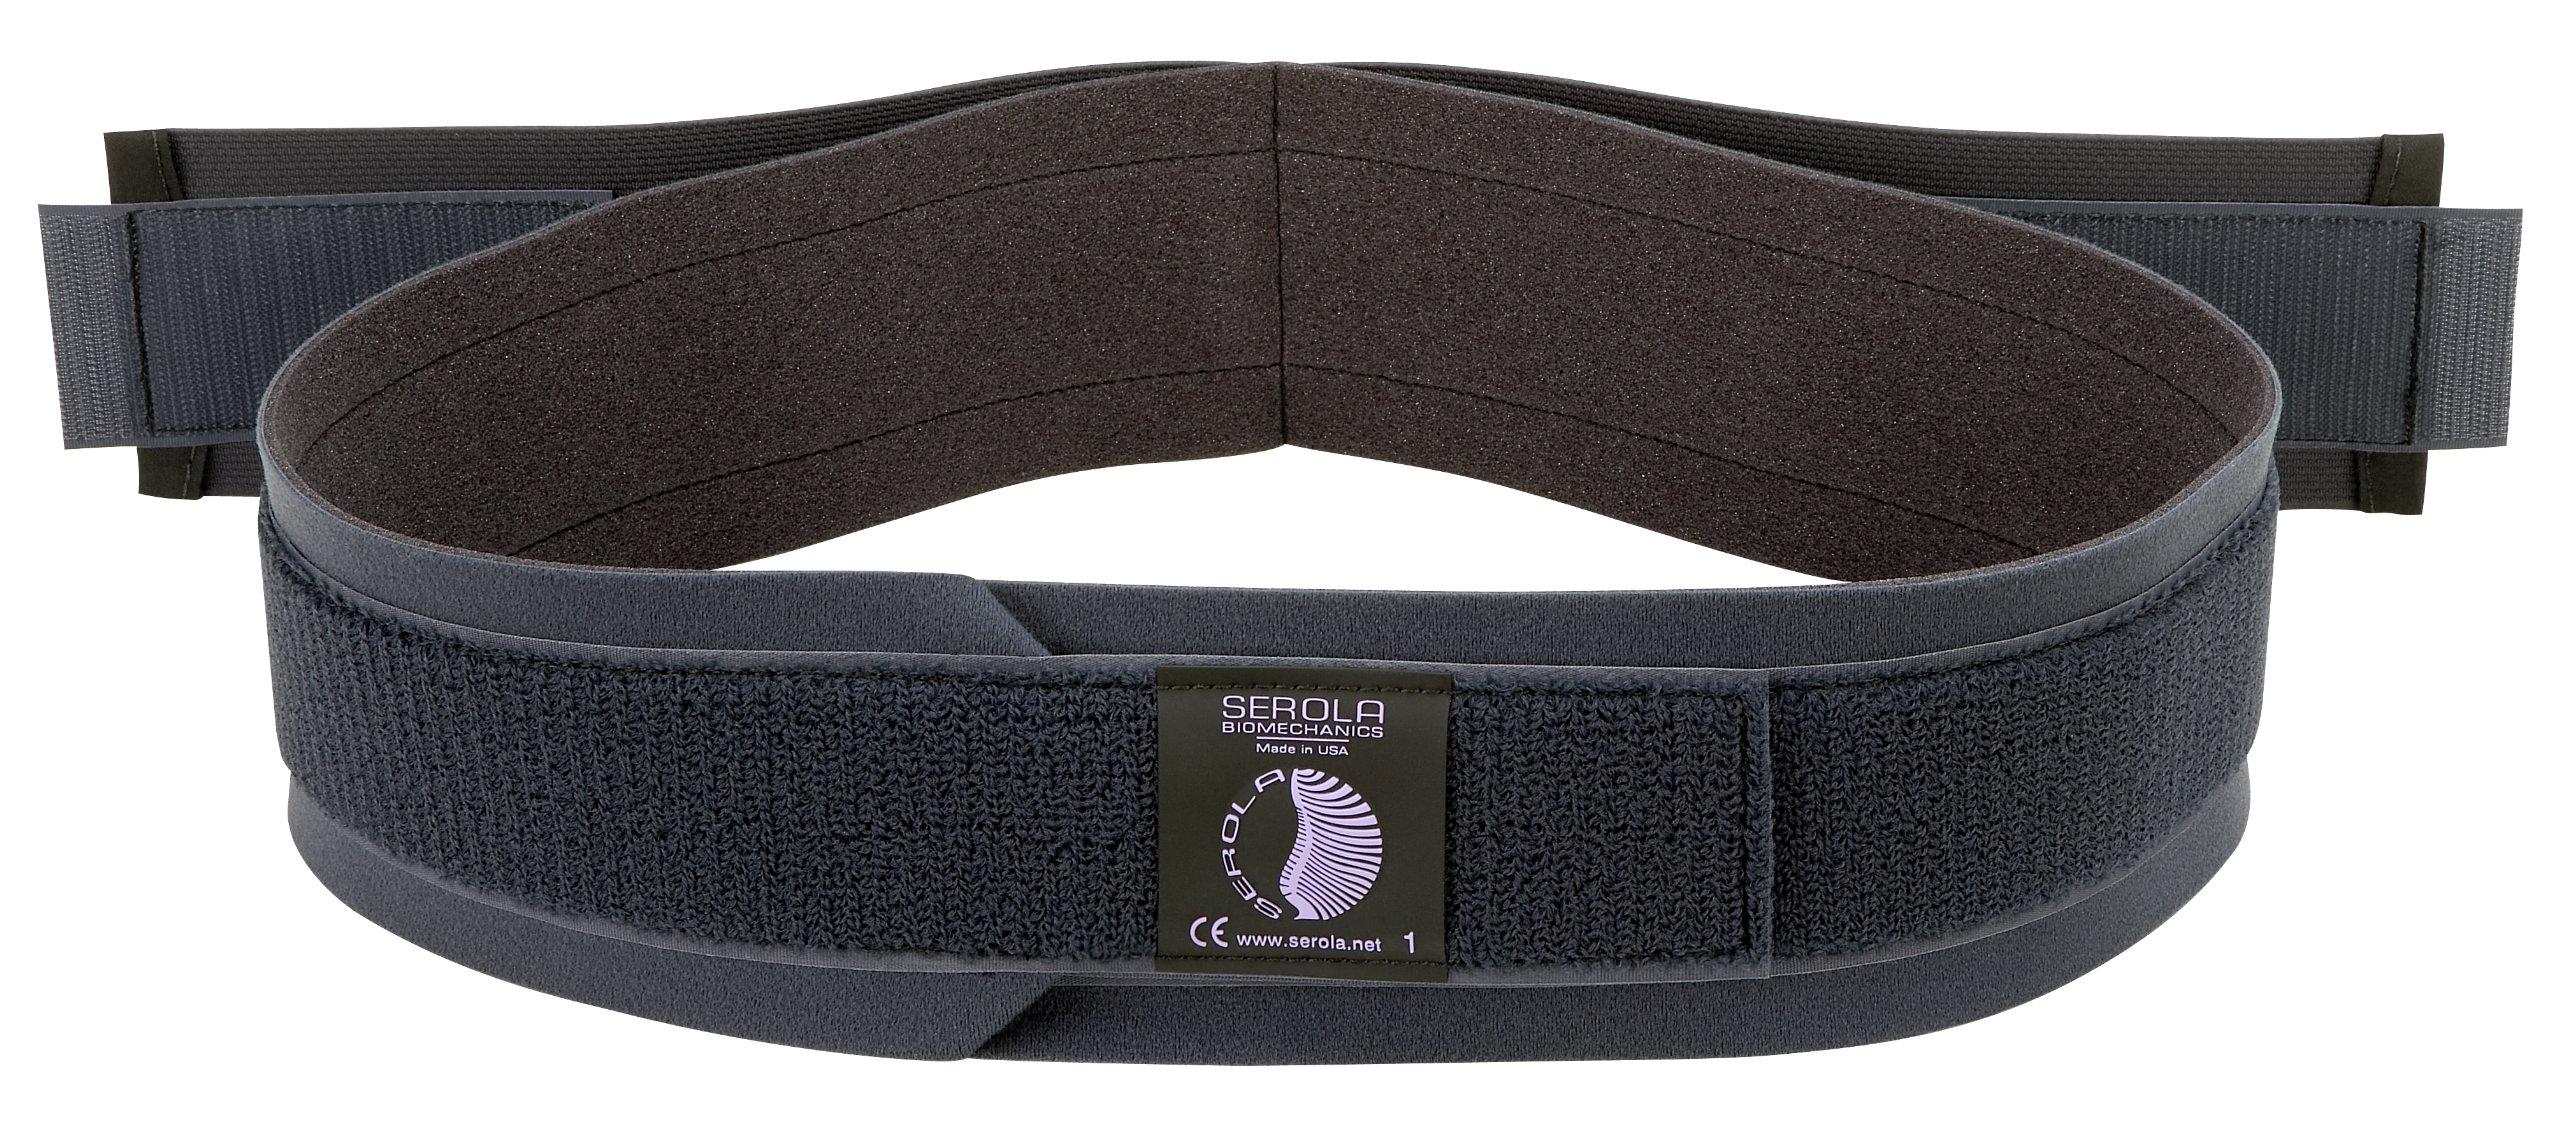 Serola Sacroiliac Belt, Large Fits 40-Inch to 46-Inch hip